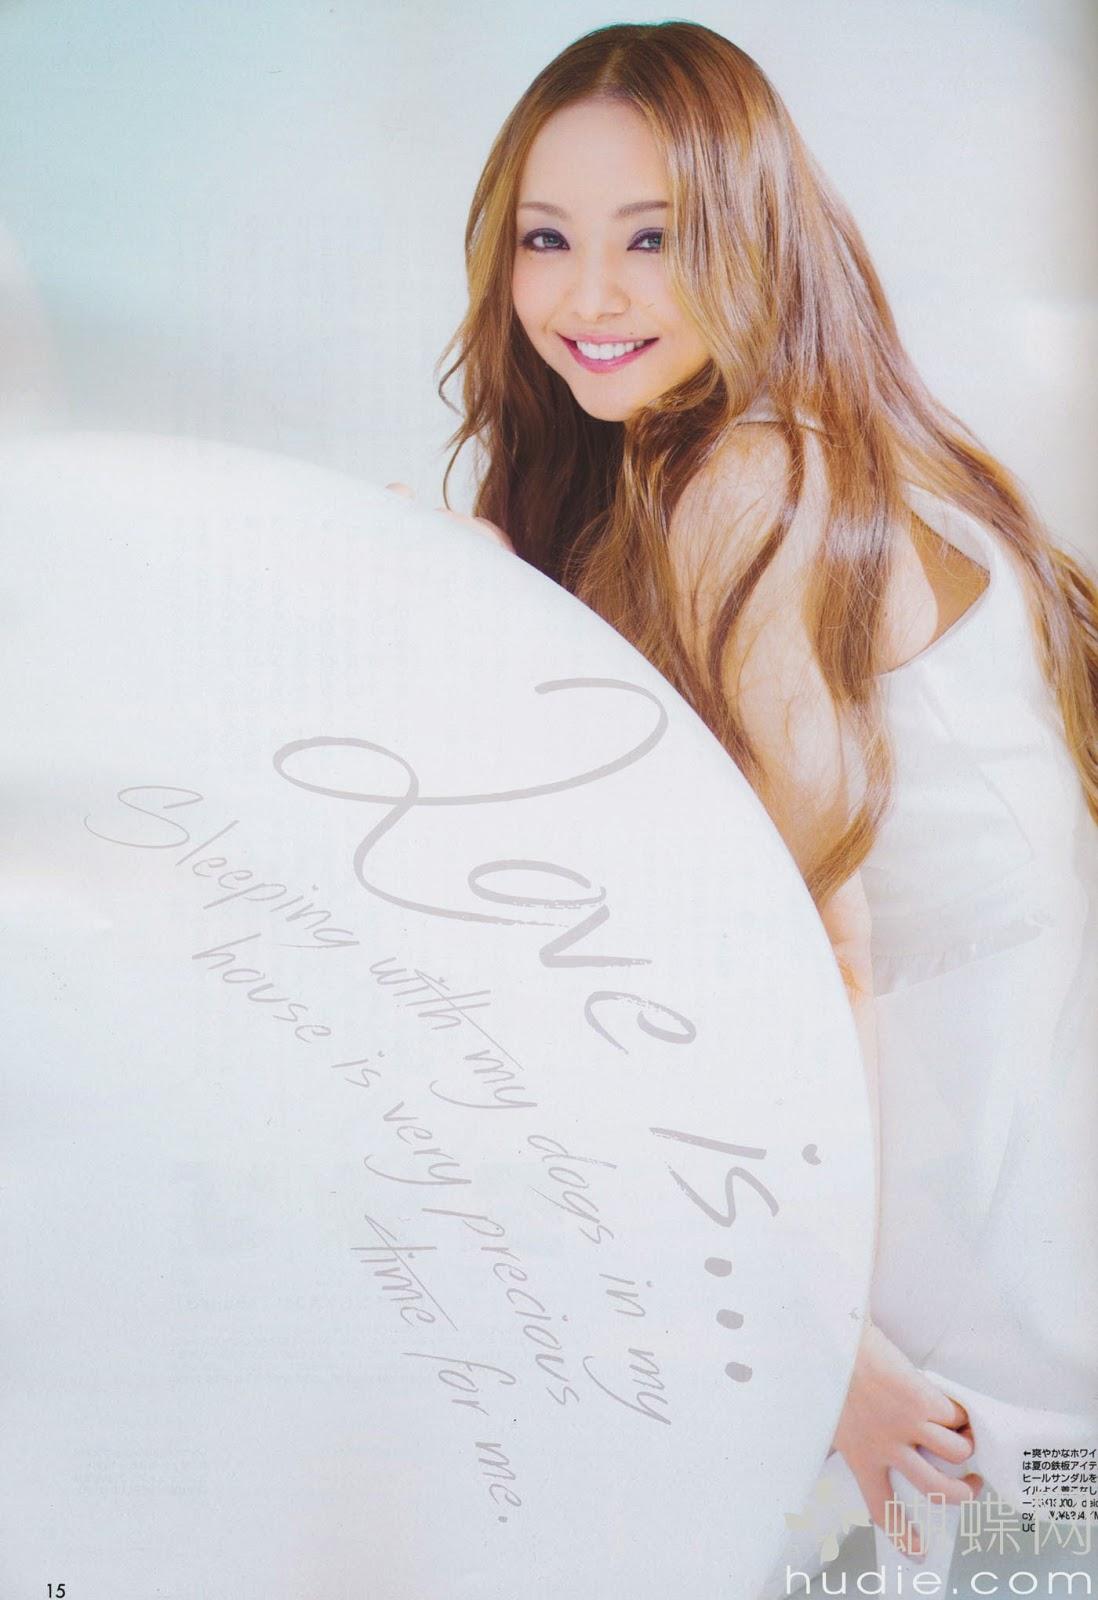 Namie Amuro For Vivi Magazine, Japan, July 2014